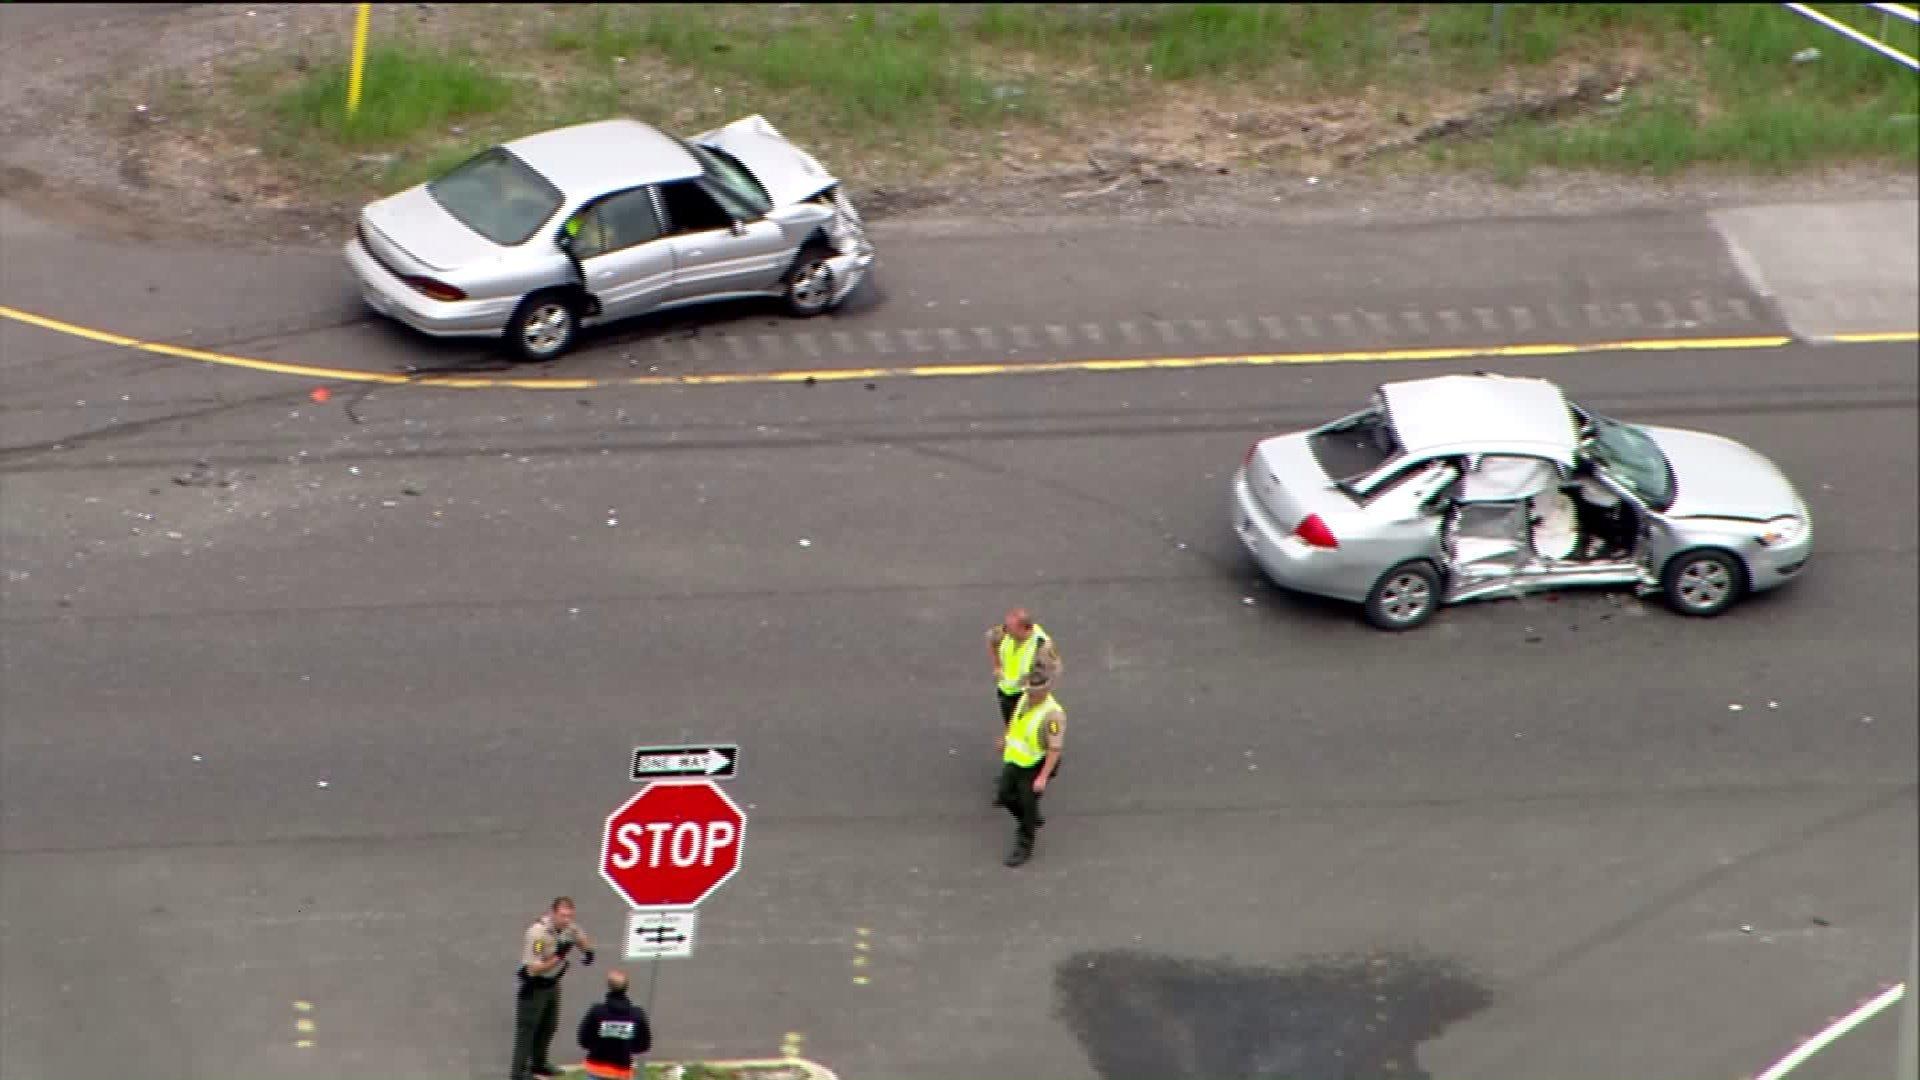 Car Accident In Crete, Illinois